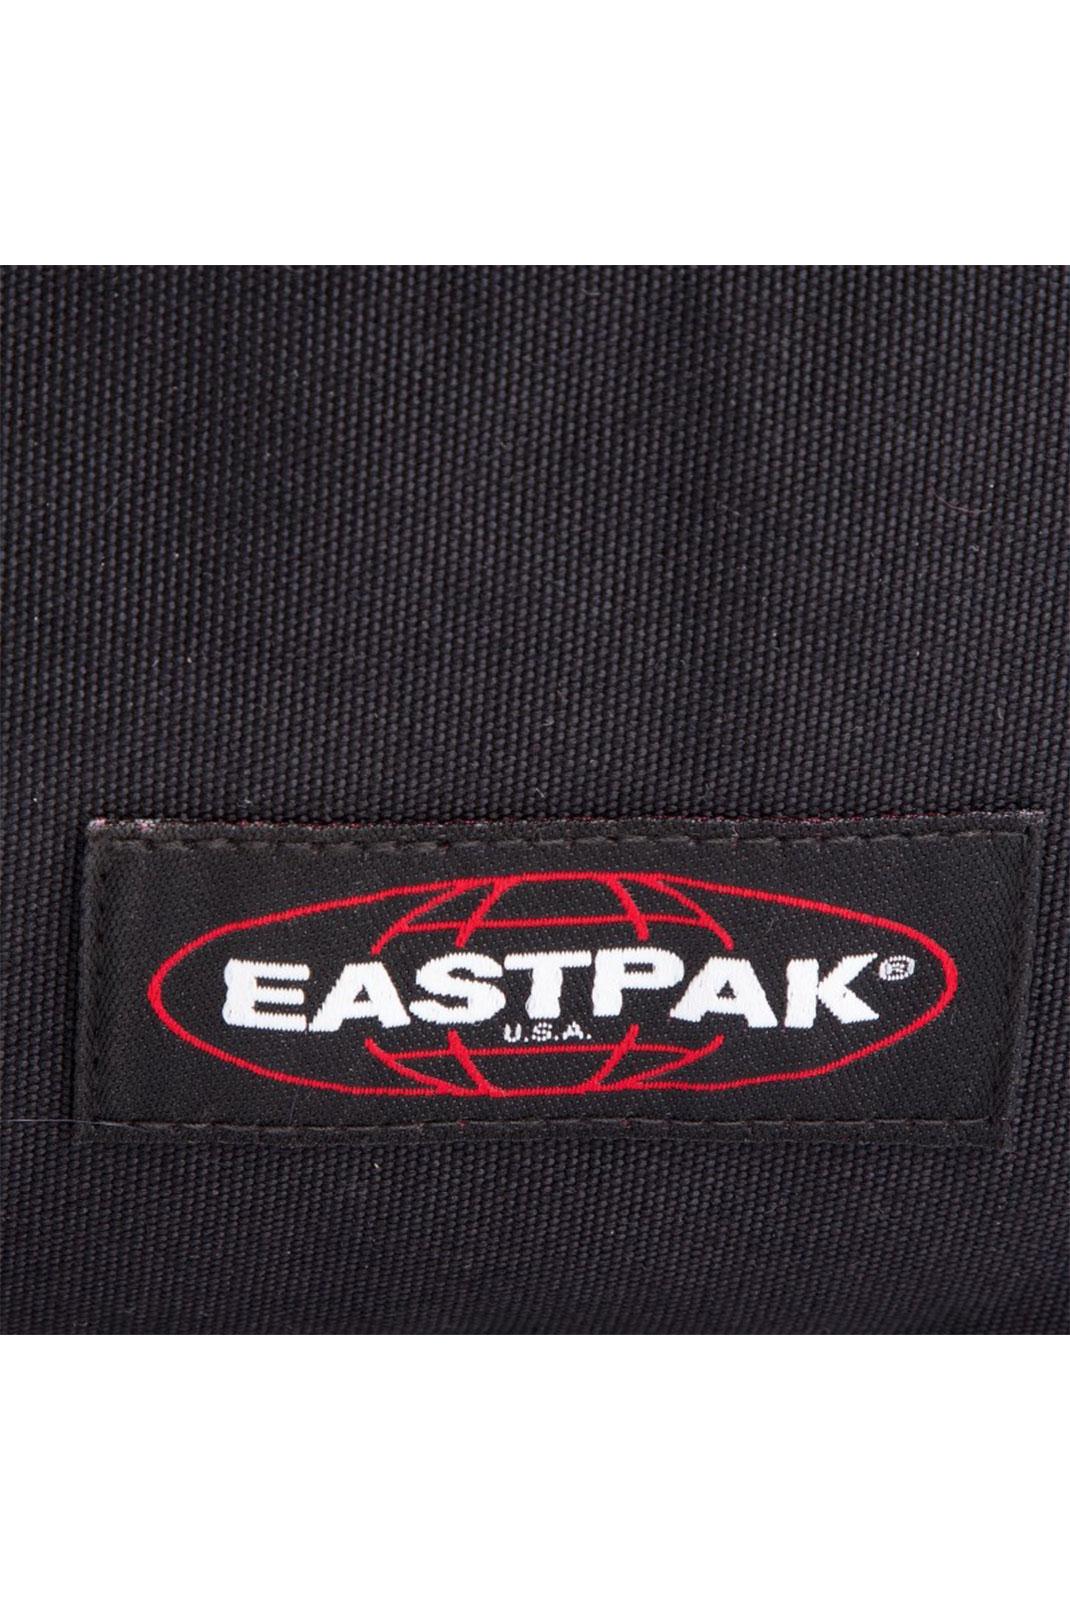 Sac porté épaule  Eastpak EK074008  008 NOIR